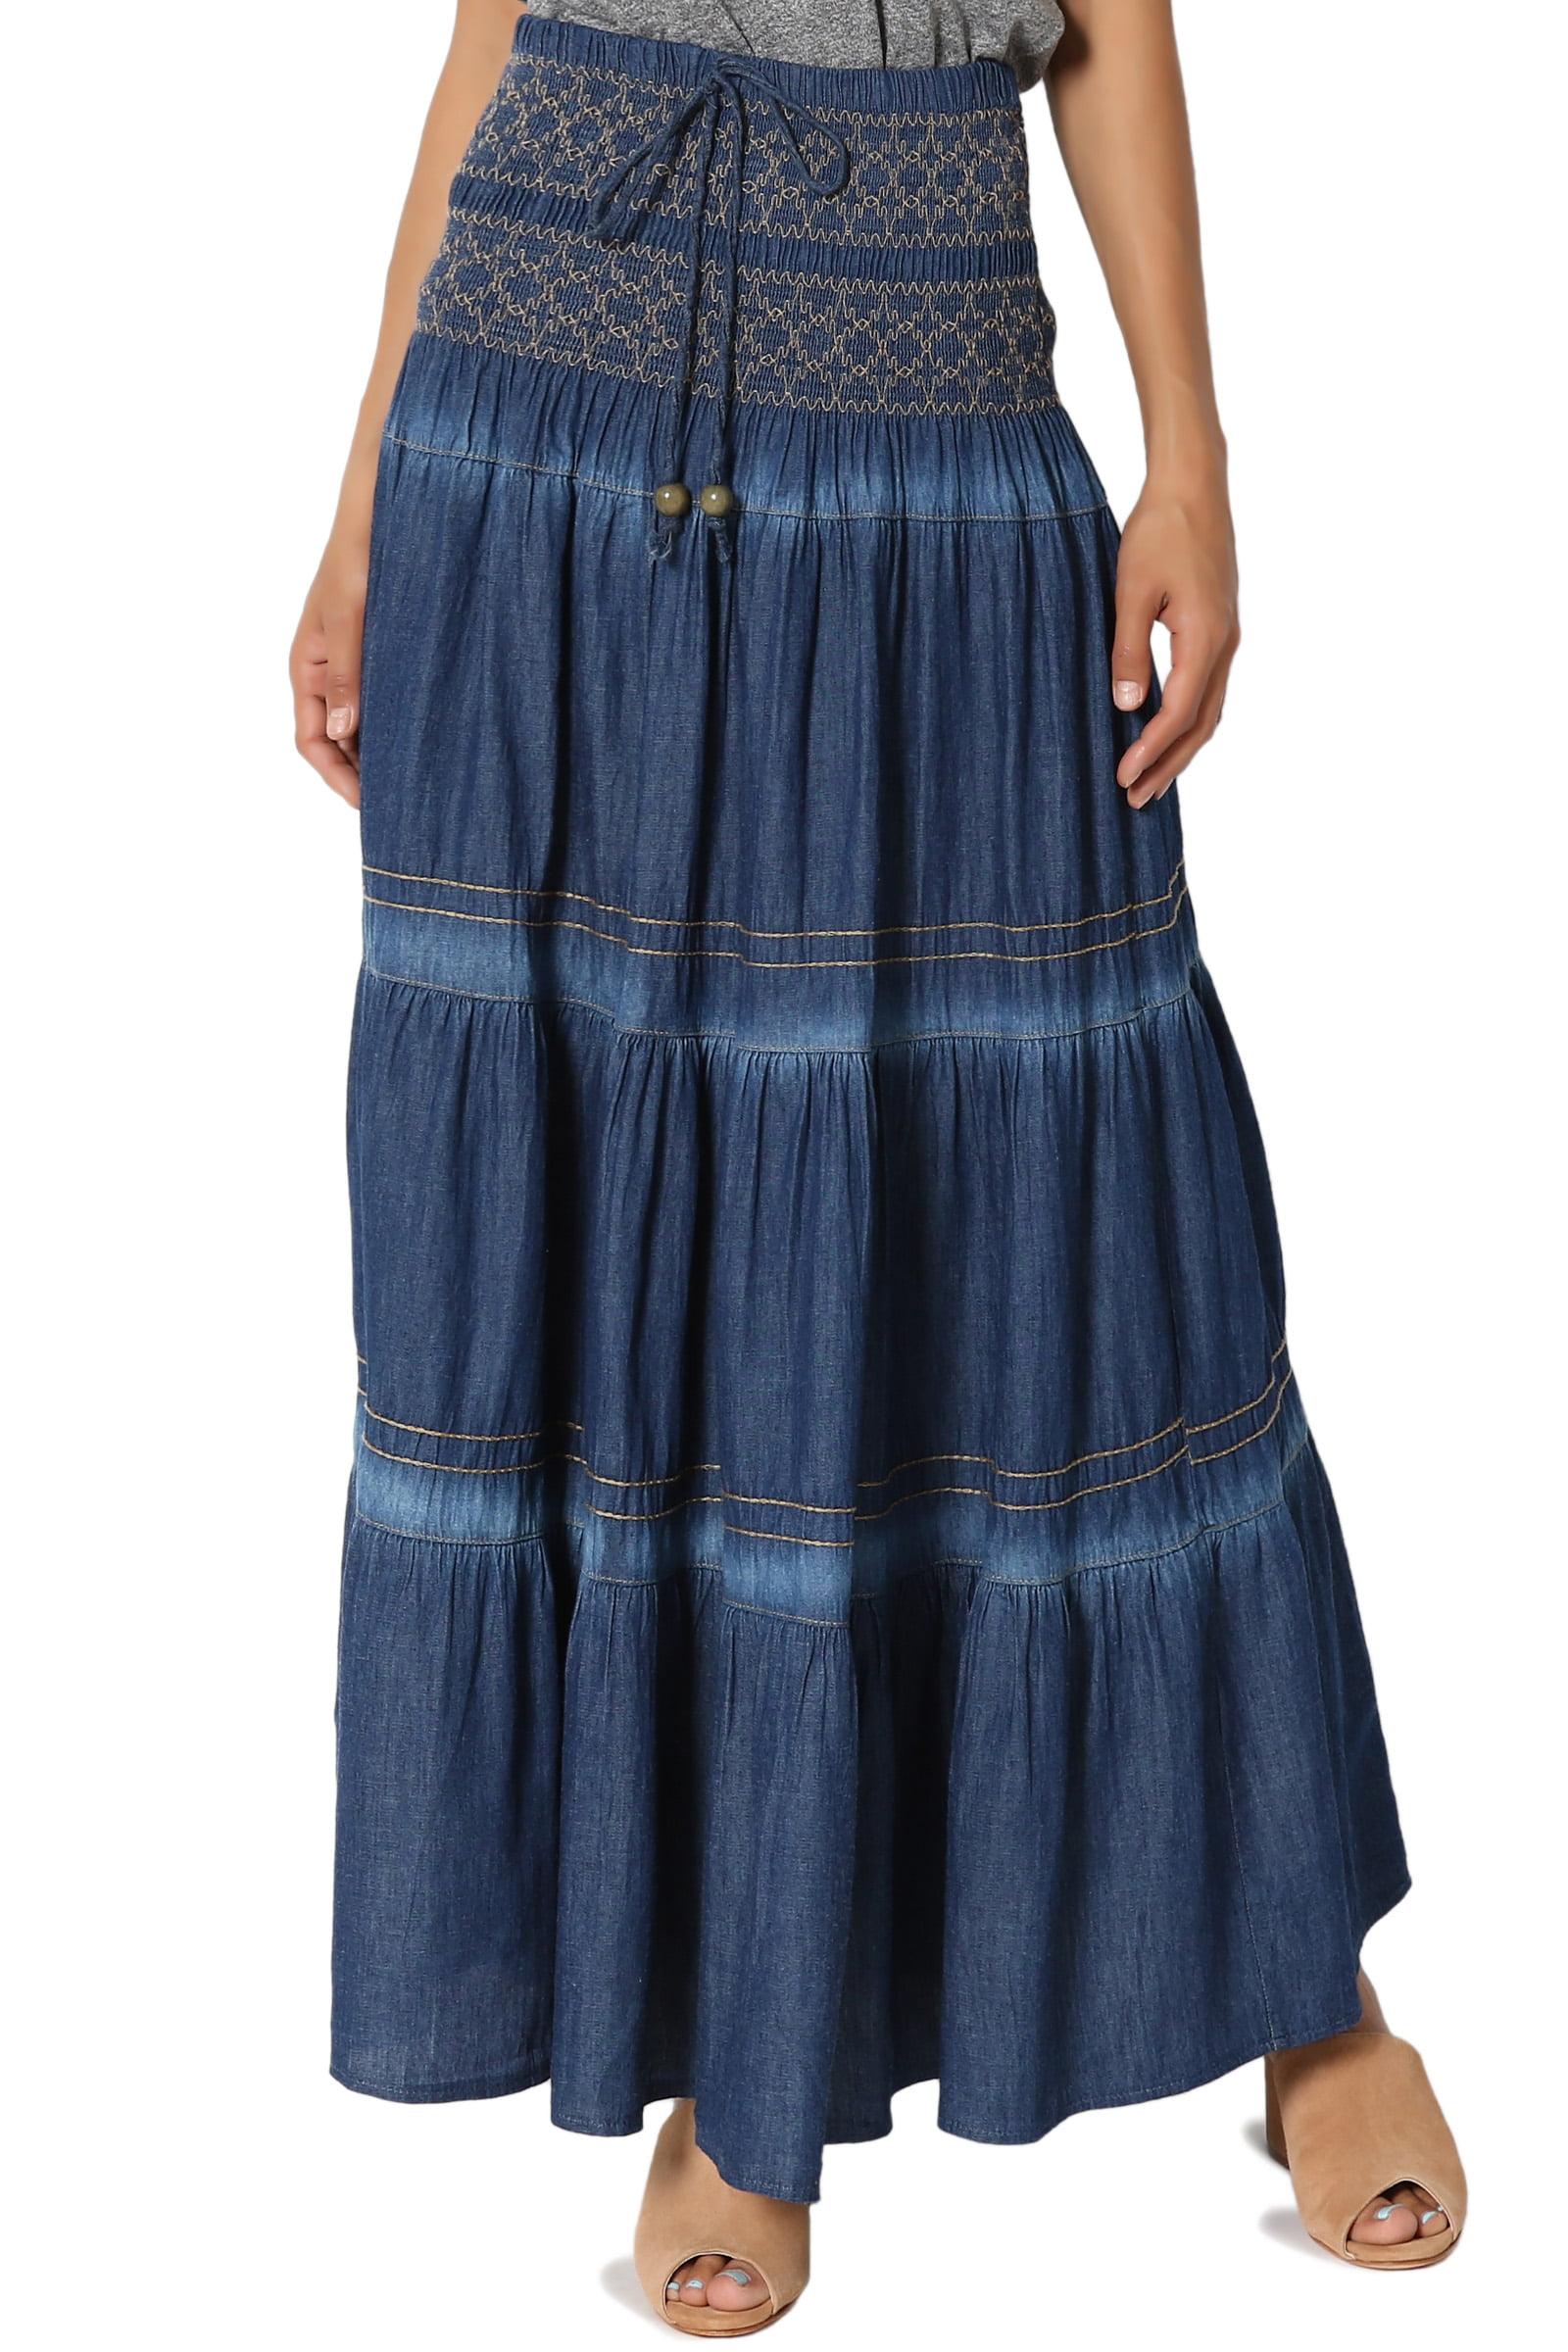 TheMogan Women's Embroidered Tiered A-Line Elasticized High Waist Long Full Maxi Skirt